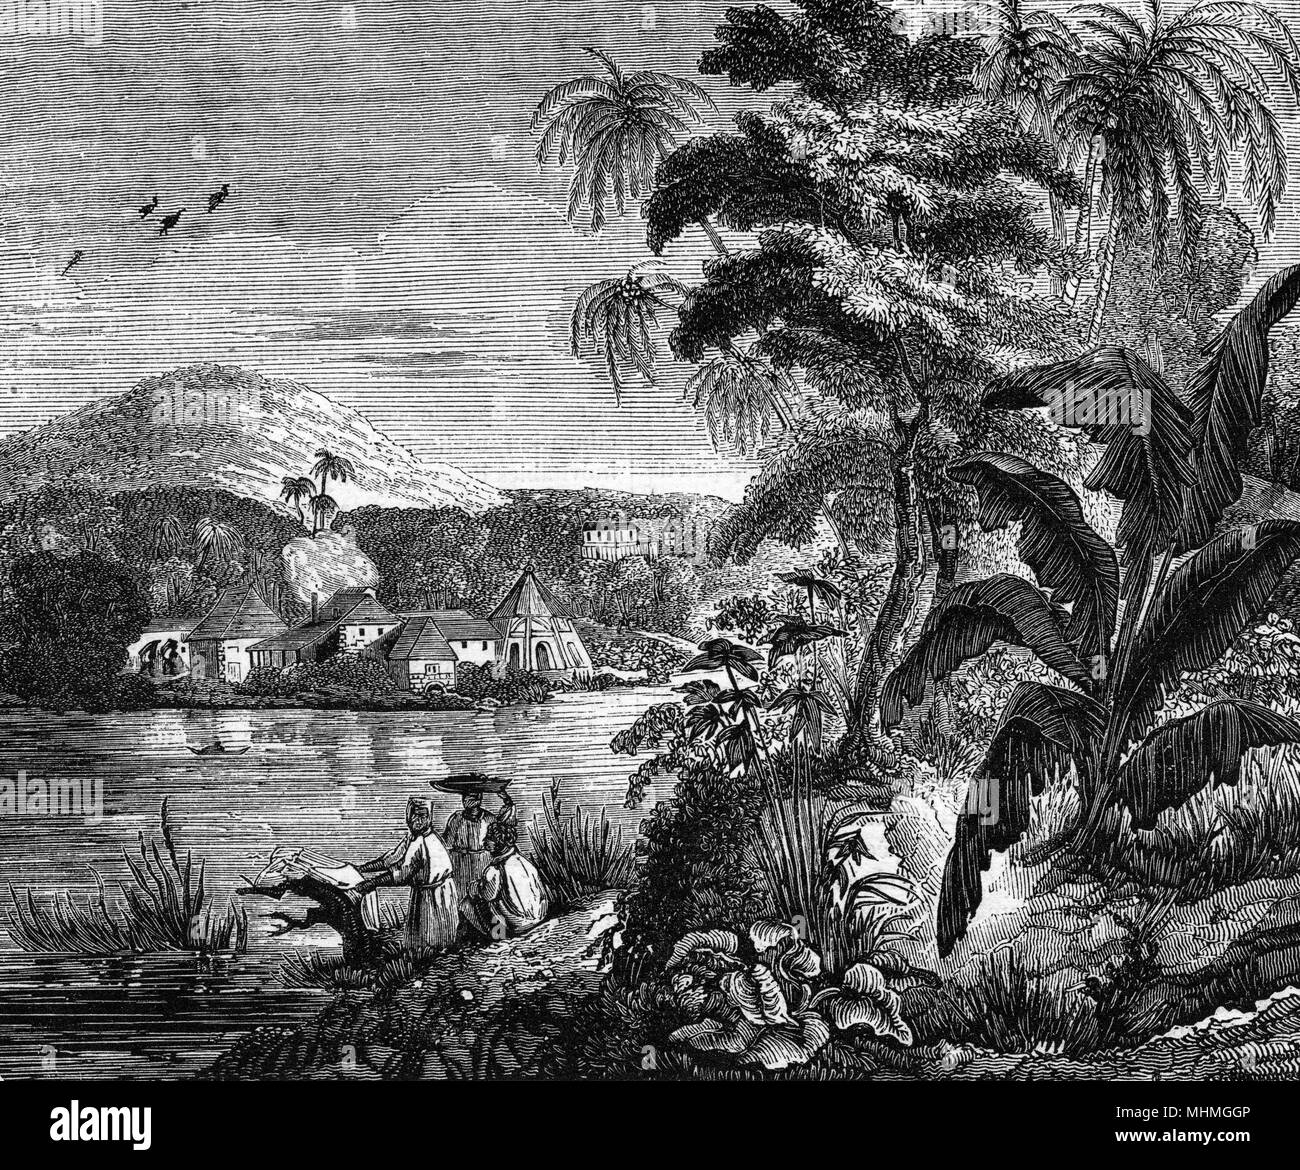 A sugar planation,        Date: 1837 Stock Photo